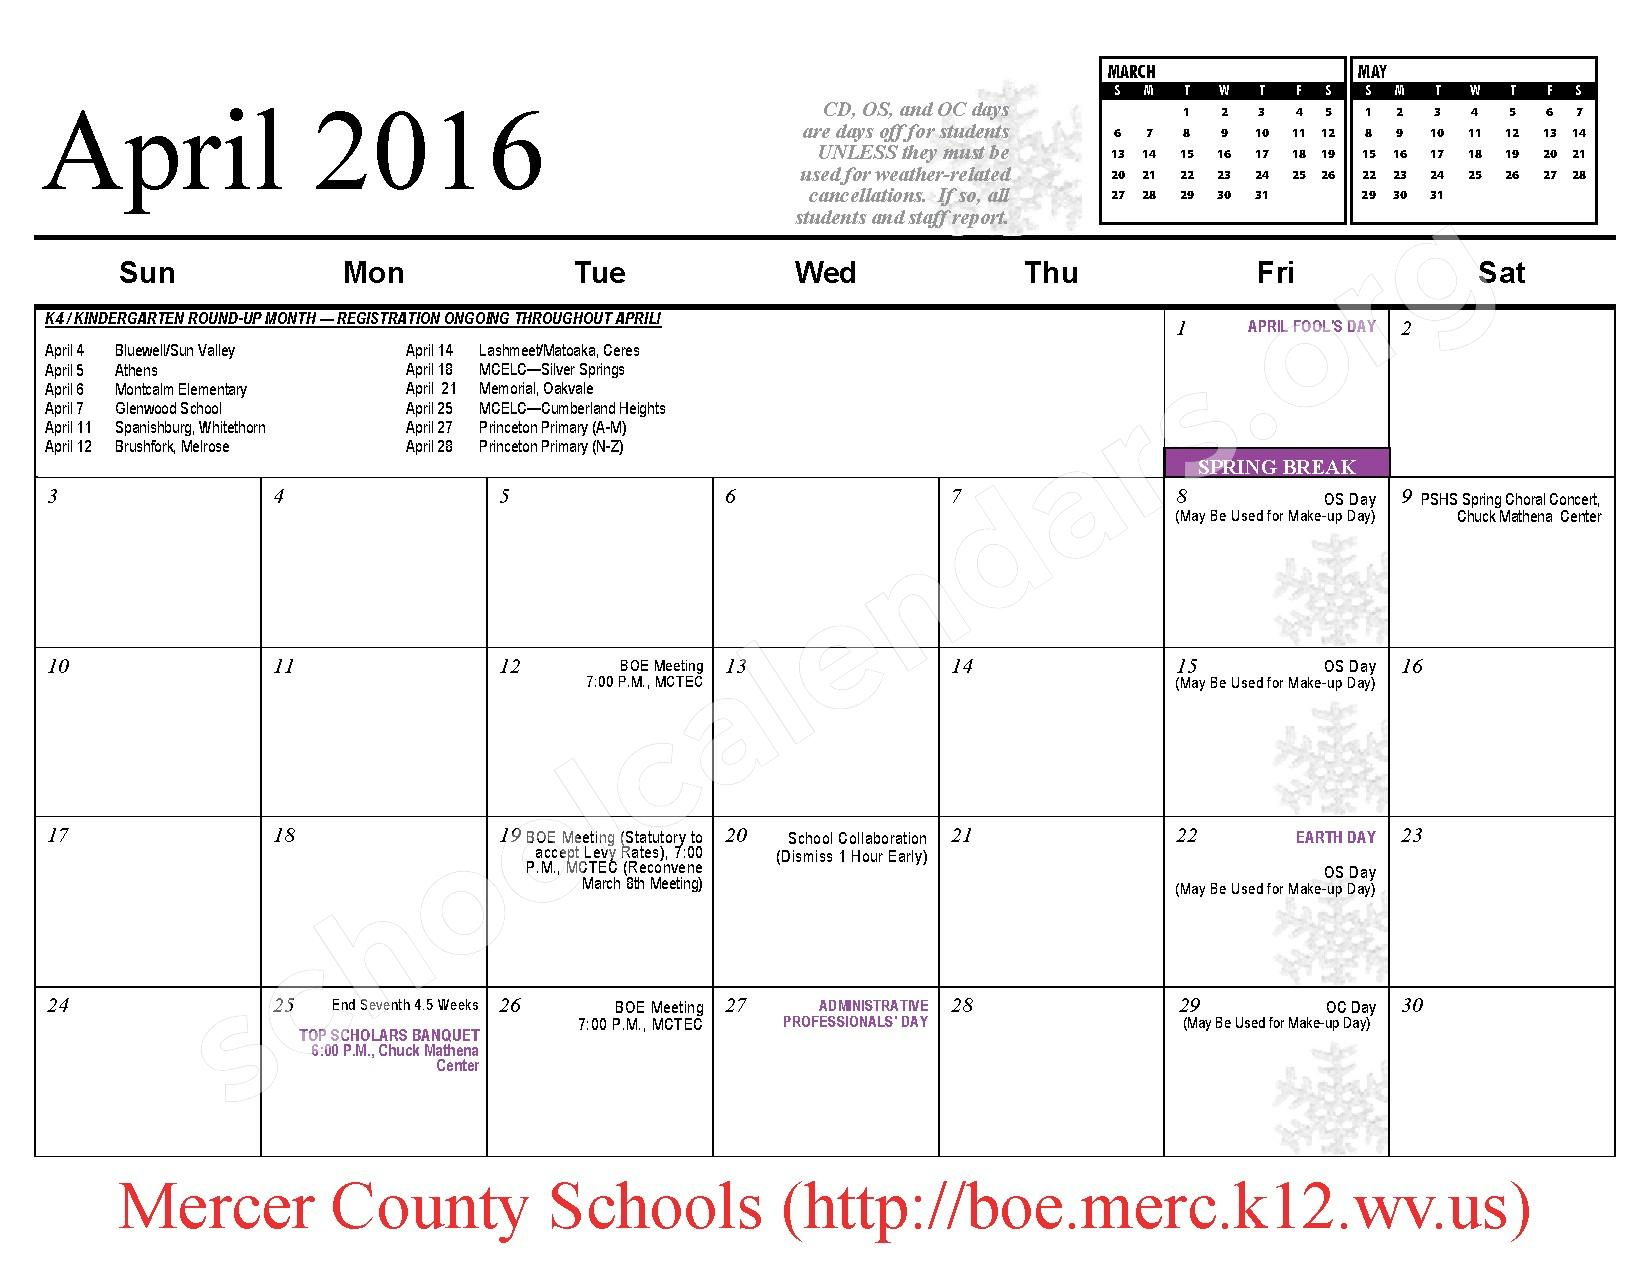 2015 - 2016 School Calendar – Mercer County Schools – page 11